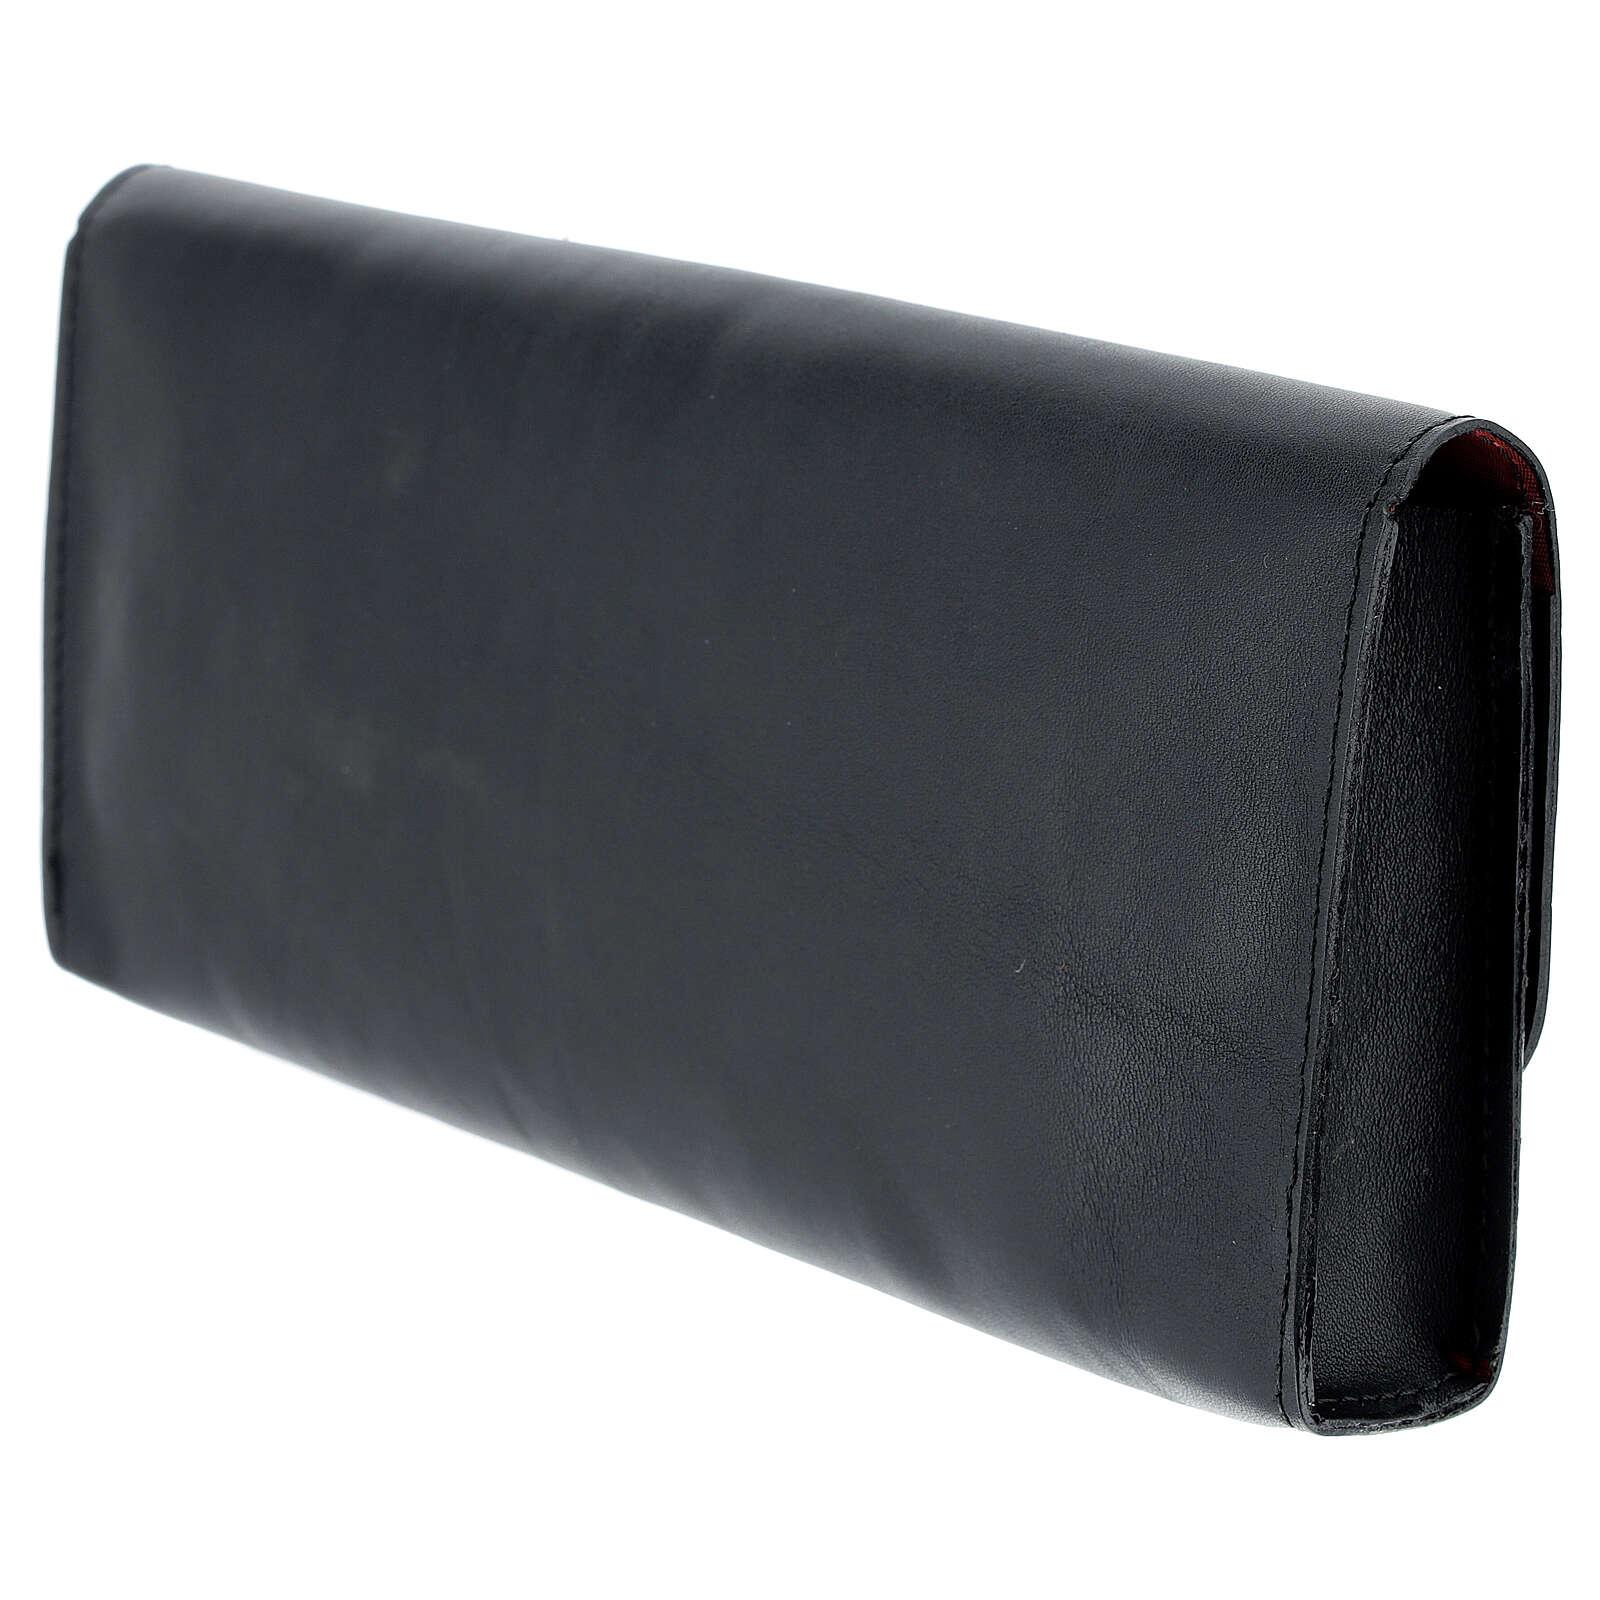 Rectangular stole burse of real black leather 4